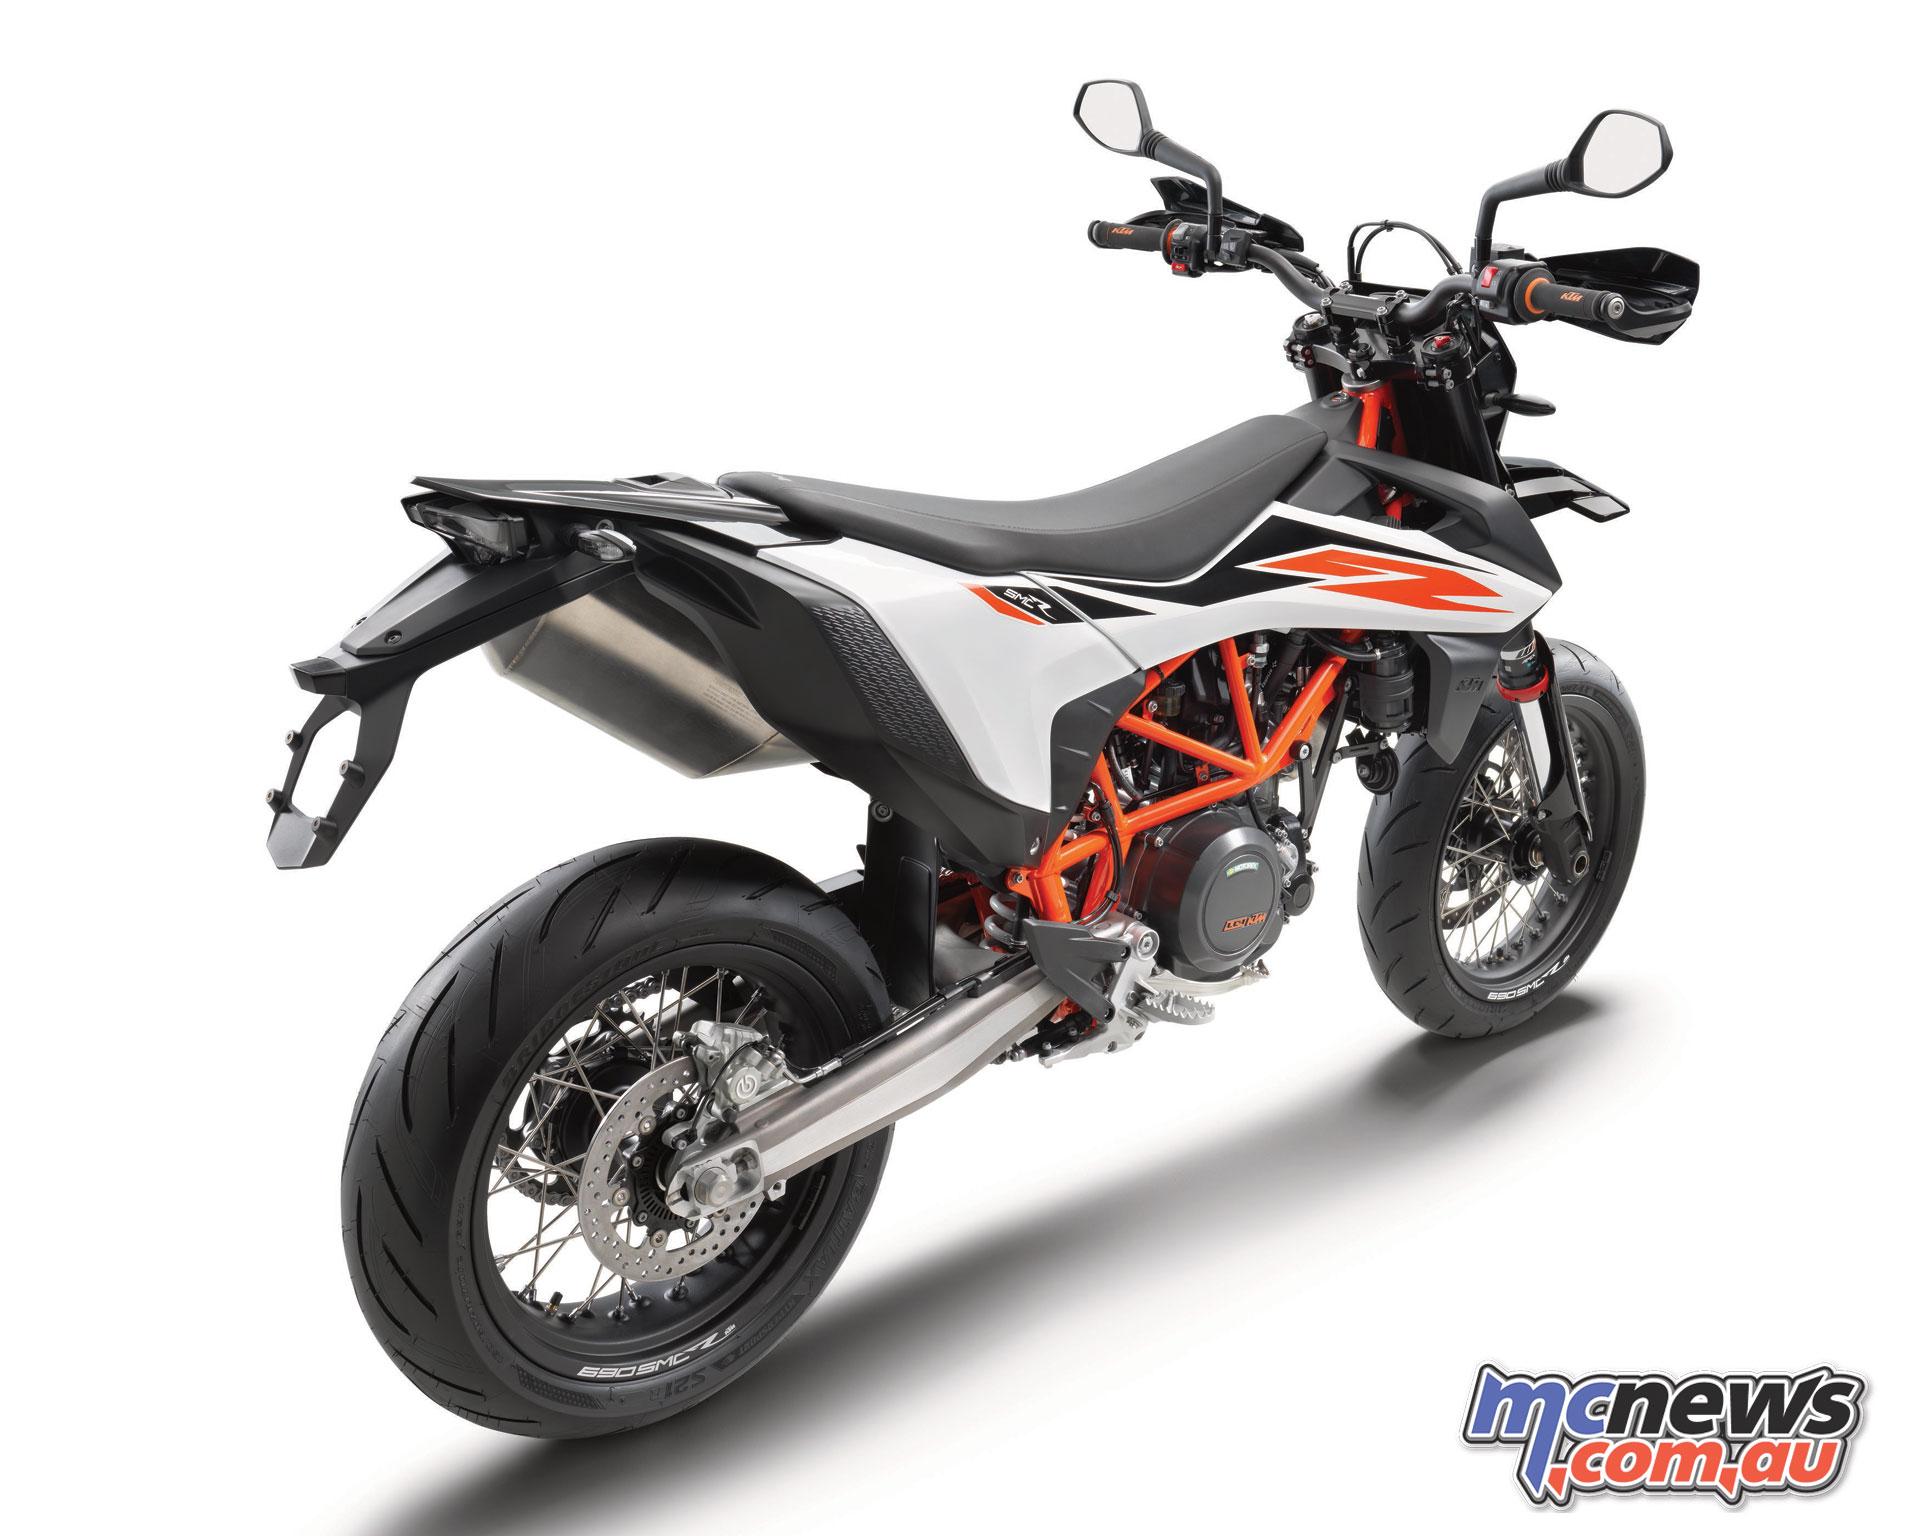 2019 KTM 690 SMC R | Upgraded engine and suspension | MCNews com au